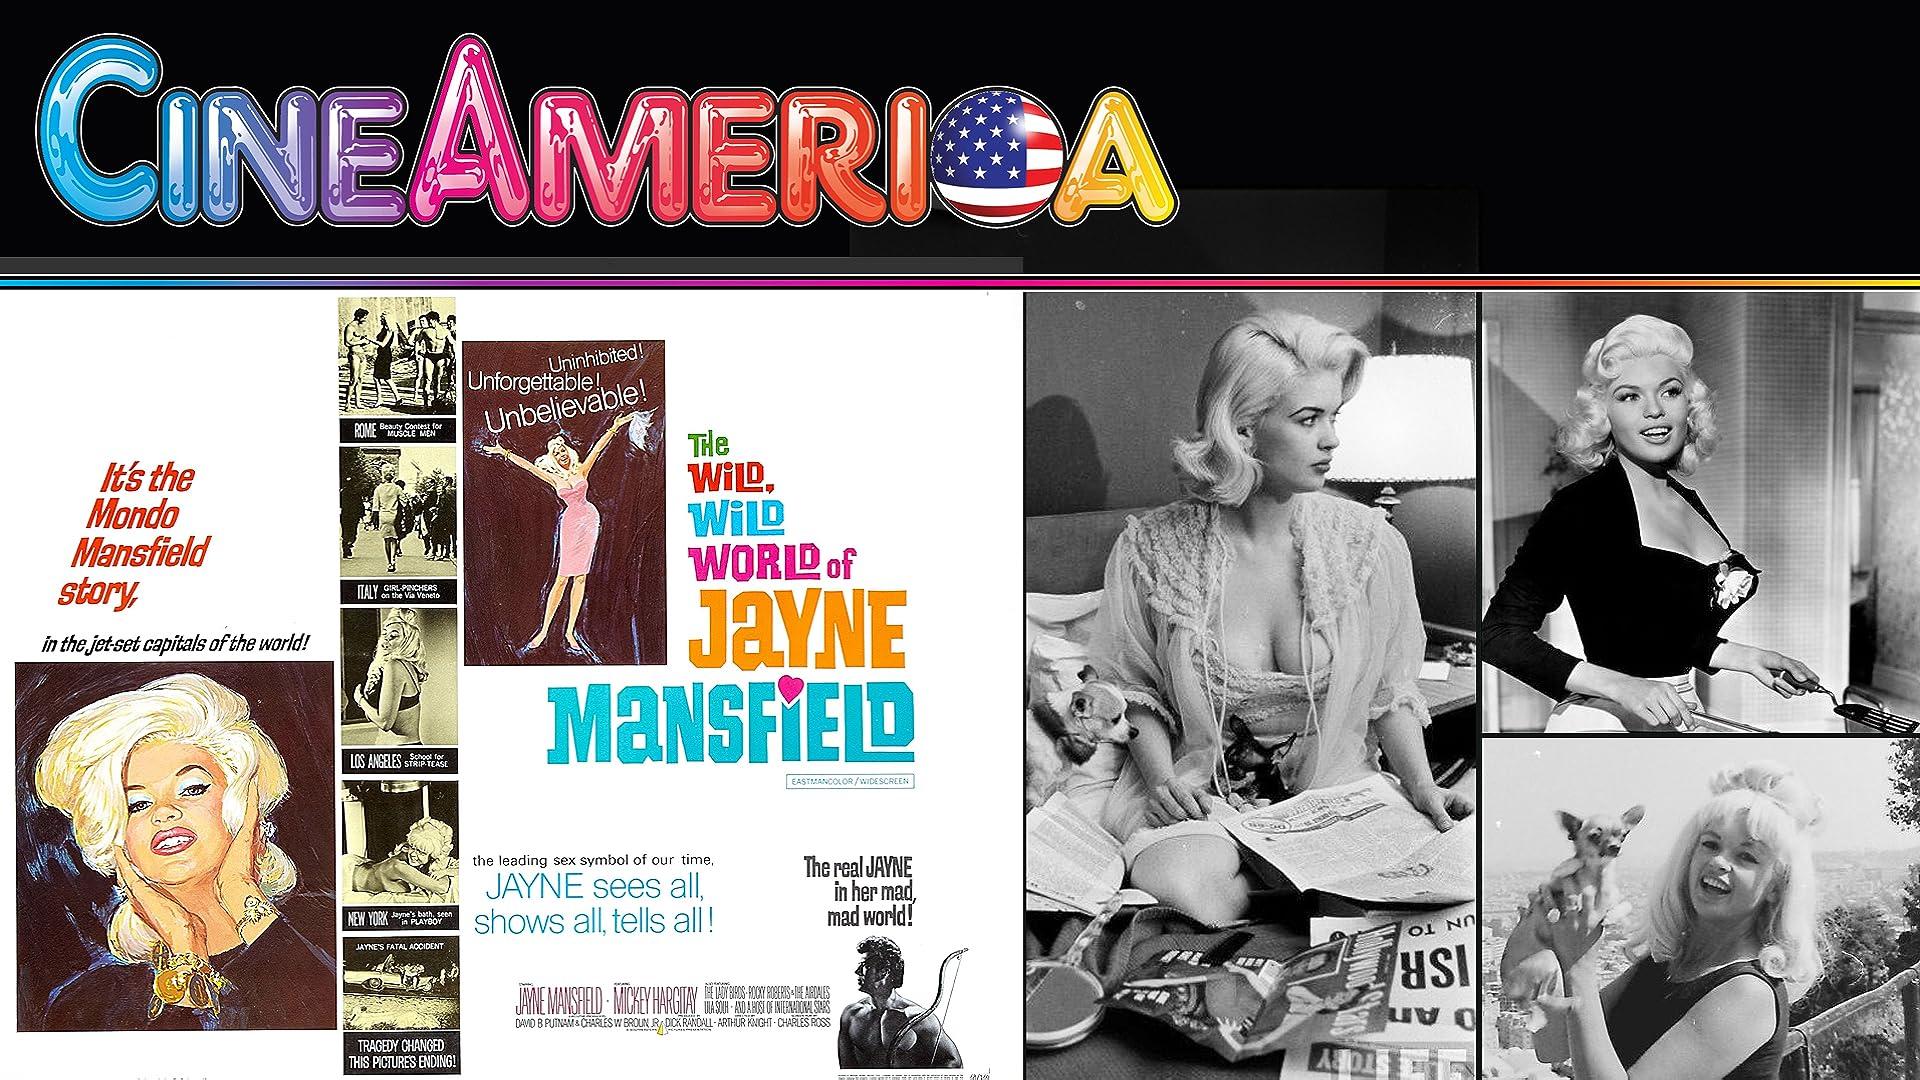 The Wild,Wild World of Jayne Mansfield